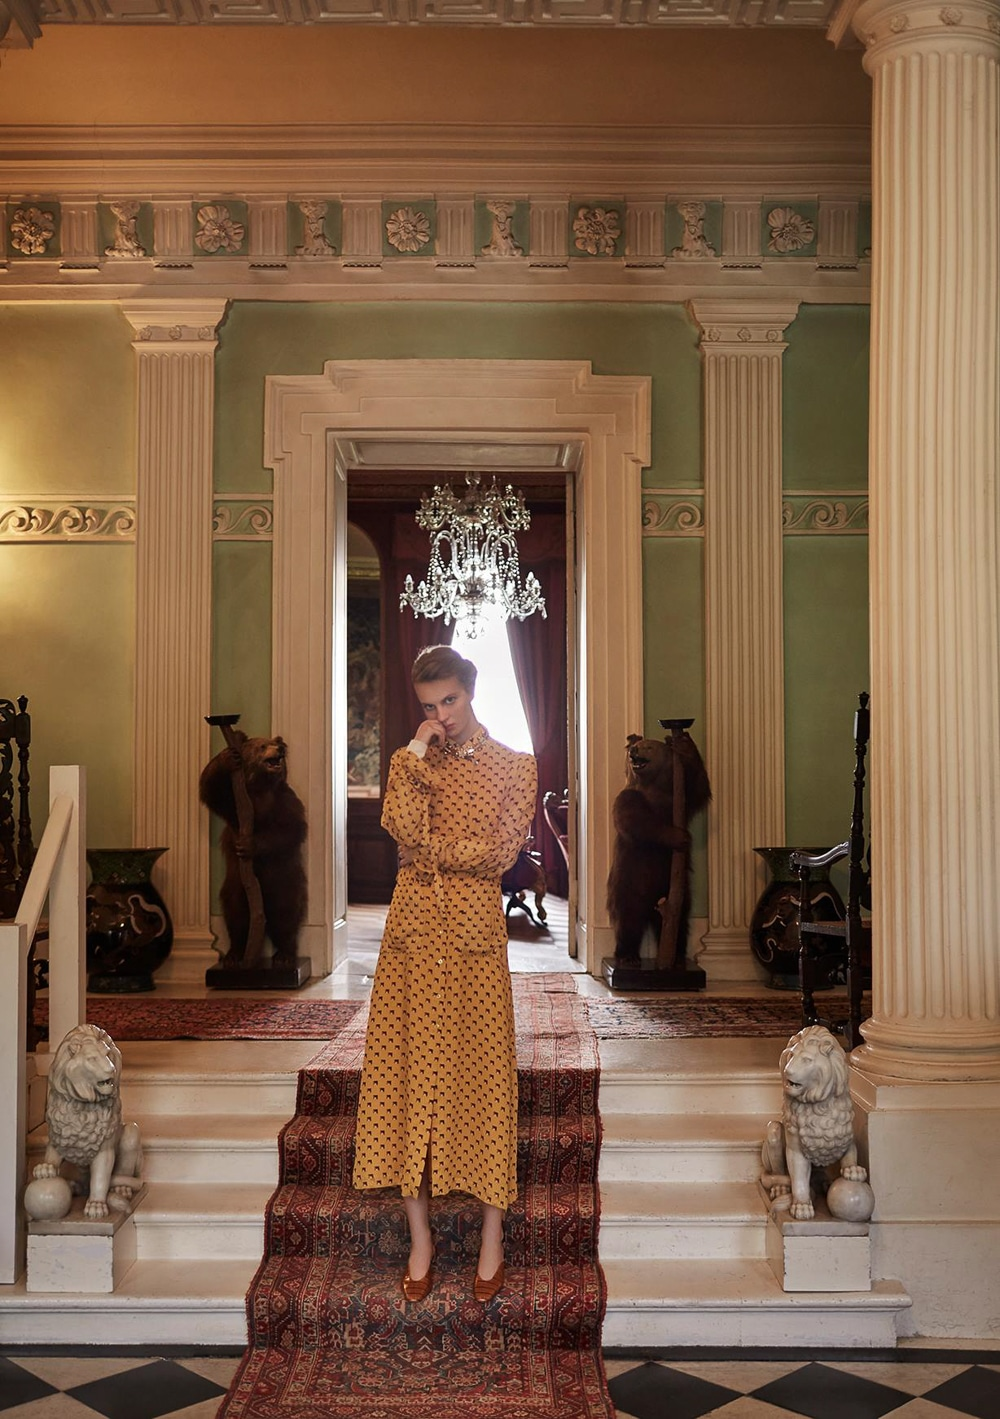 Harpers-Bazaar-UK-Septamber-2018-Florence-Kosky-Agata-Pospieszynska-9 (1).jpg